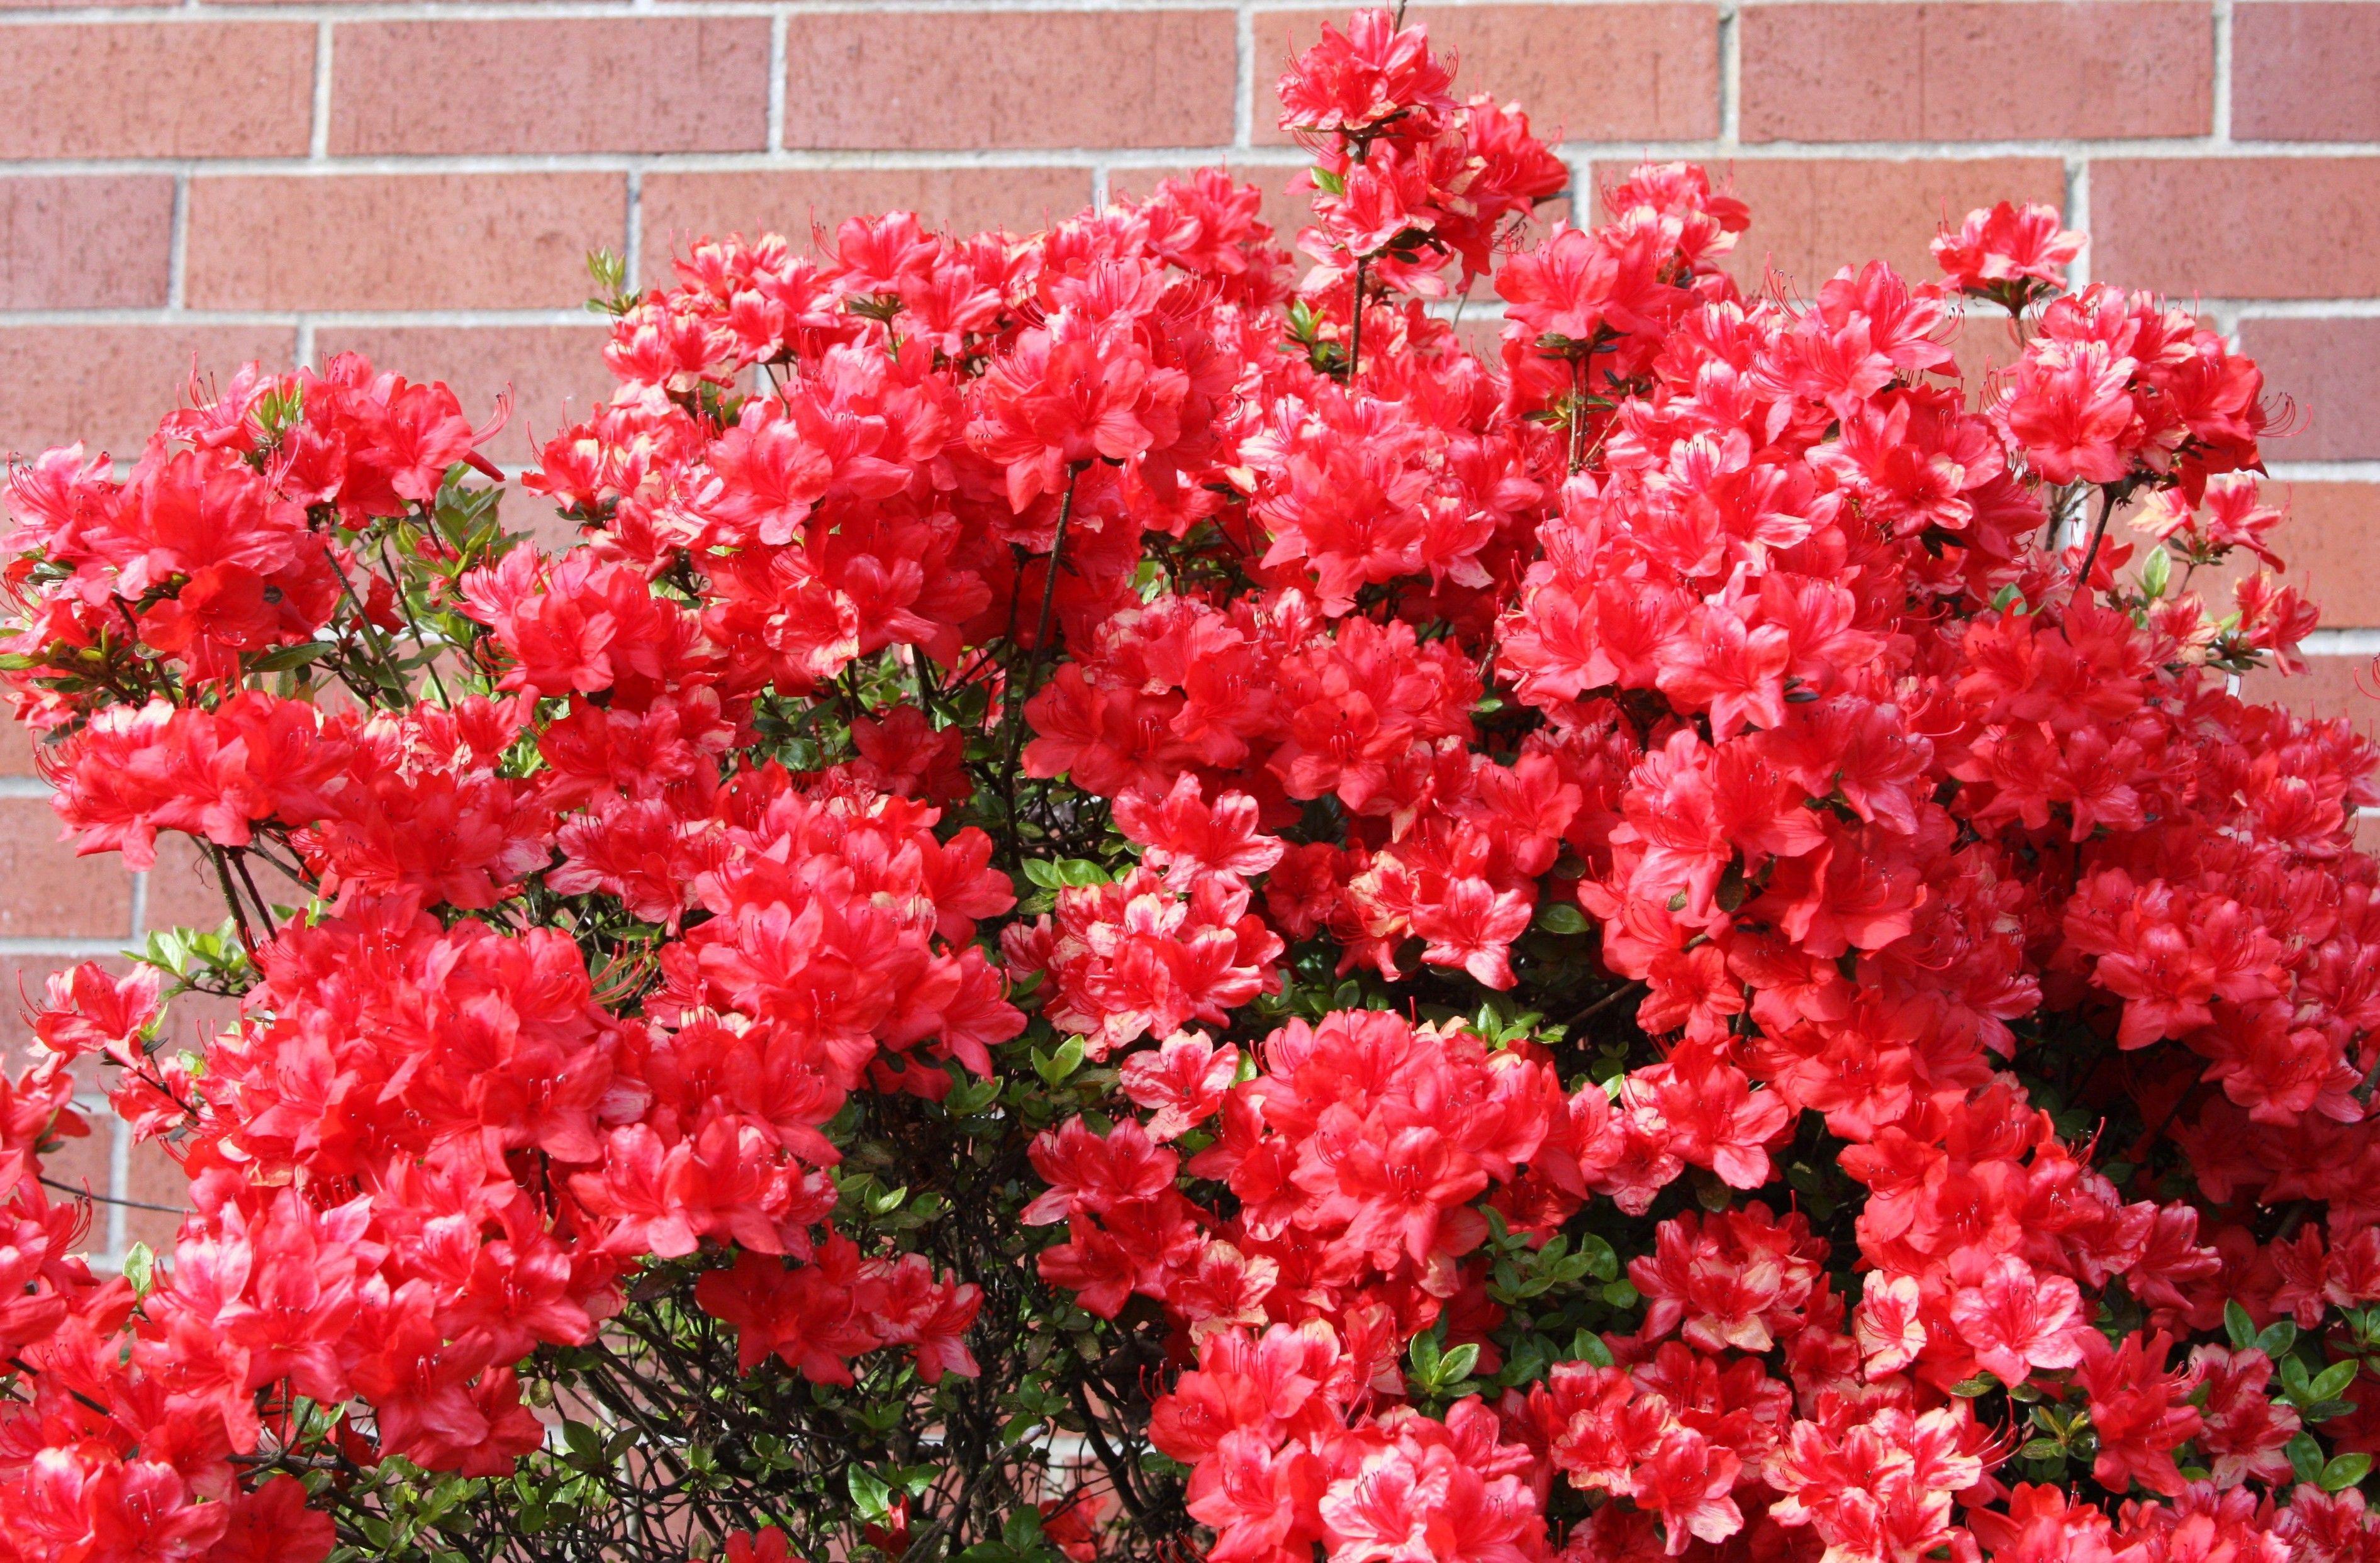 Azalea Vancouver Wa 04 2013 Azaleas Flowers Plants